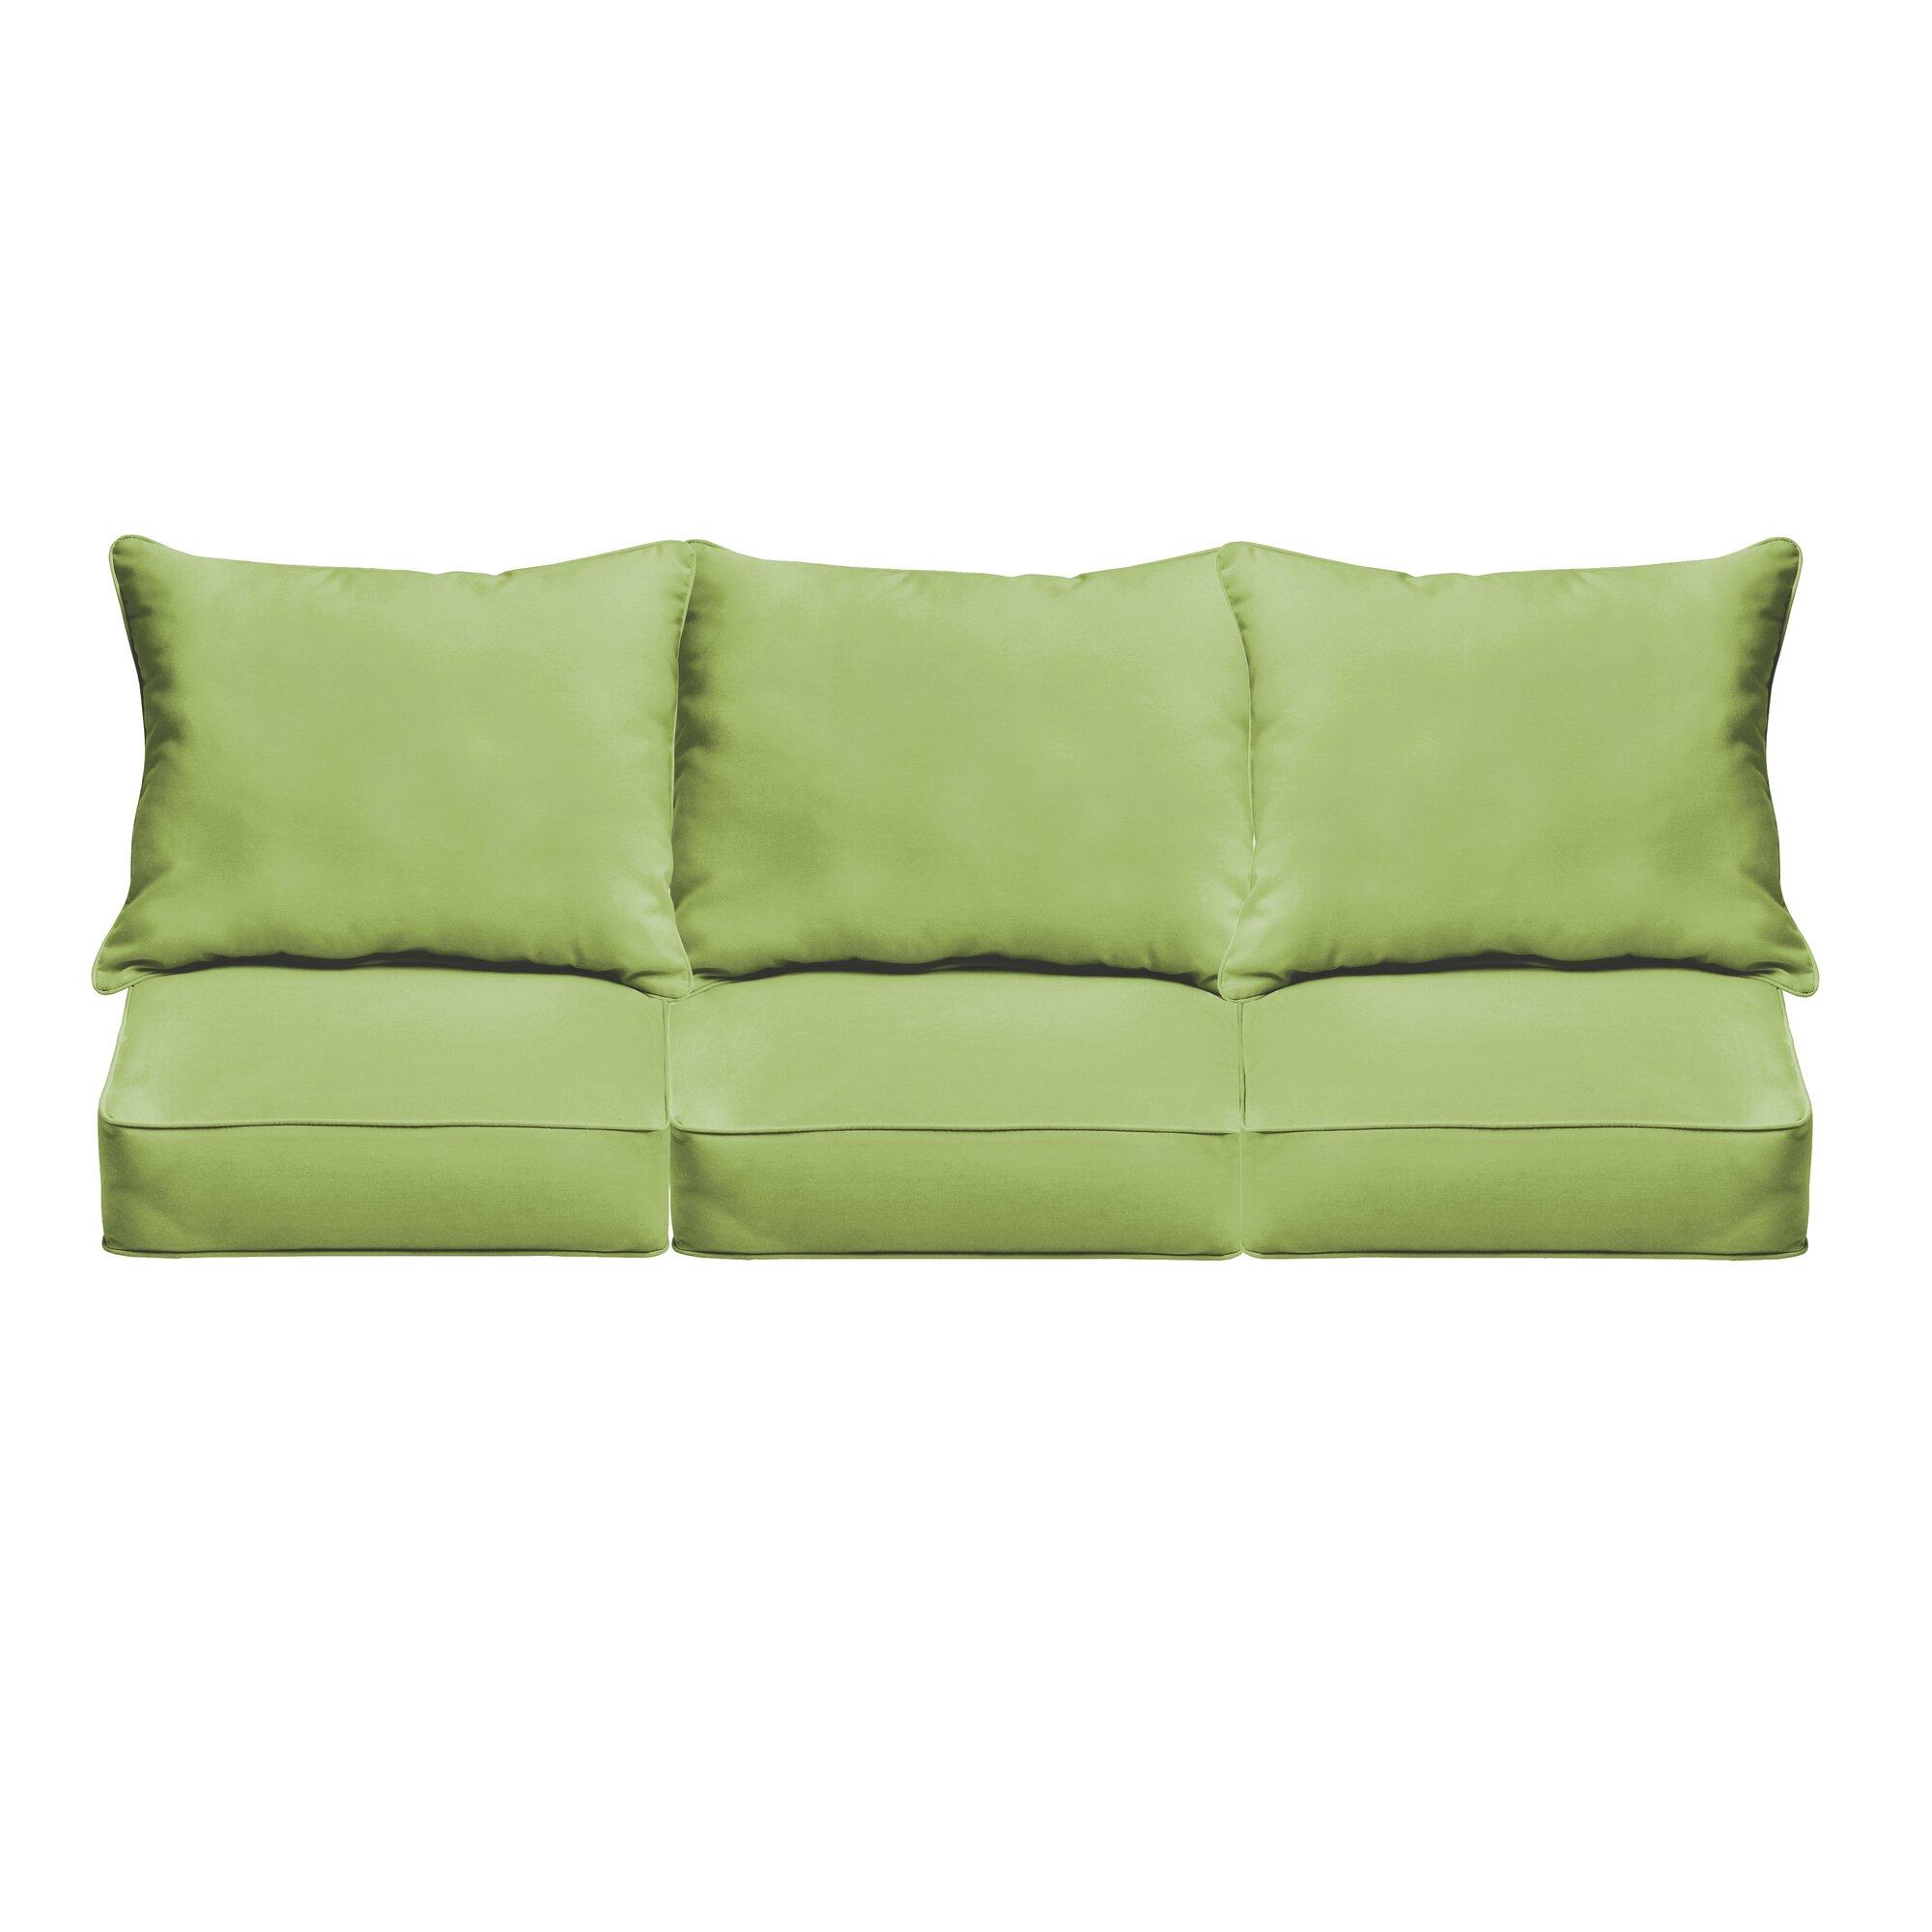 Brayden Studio Kaplan Outdoor Sofa CushionsReviewsWayfair